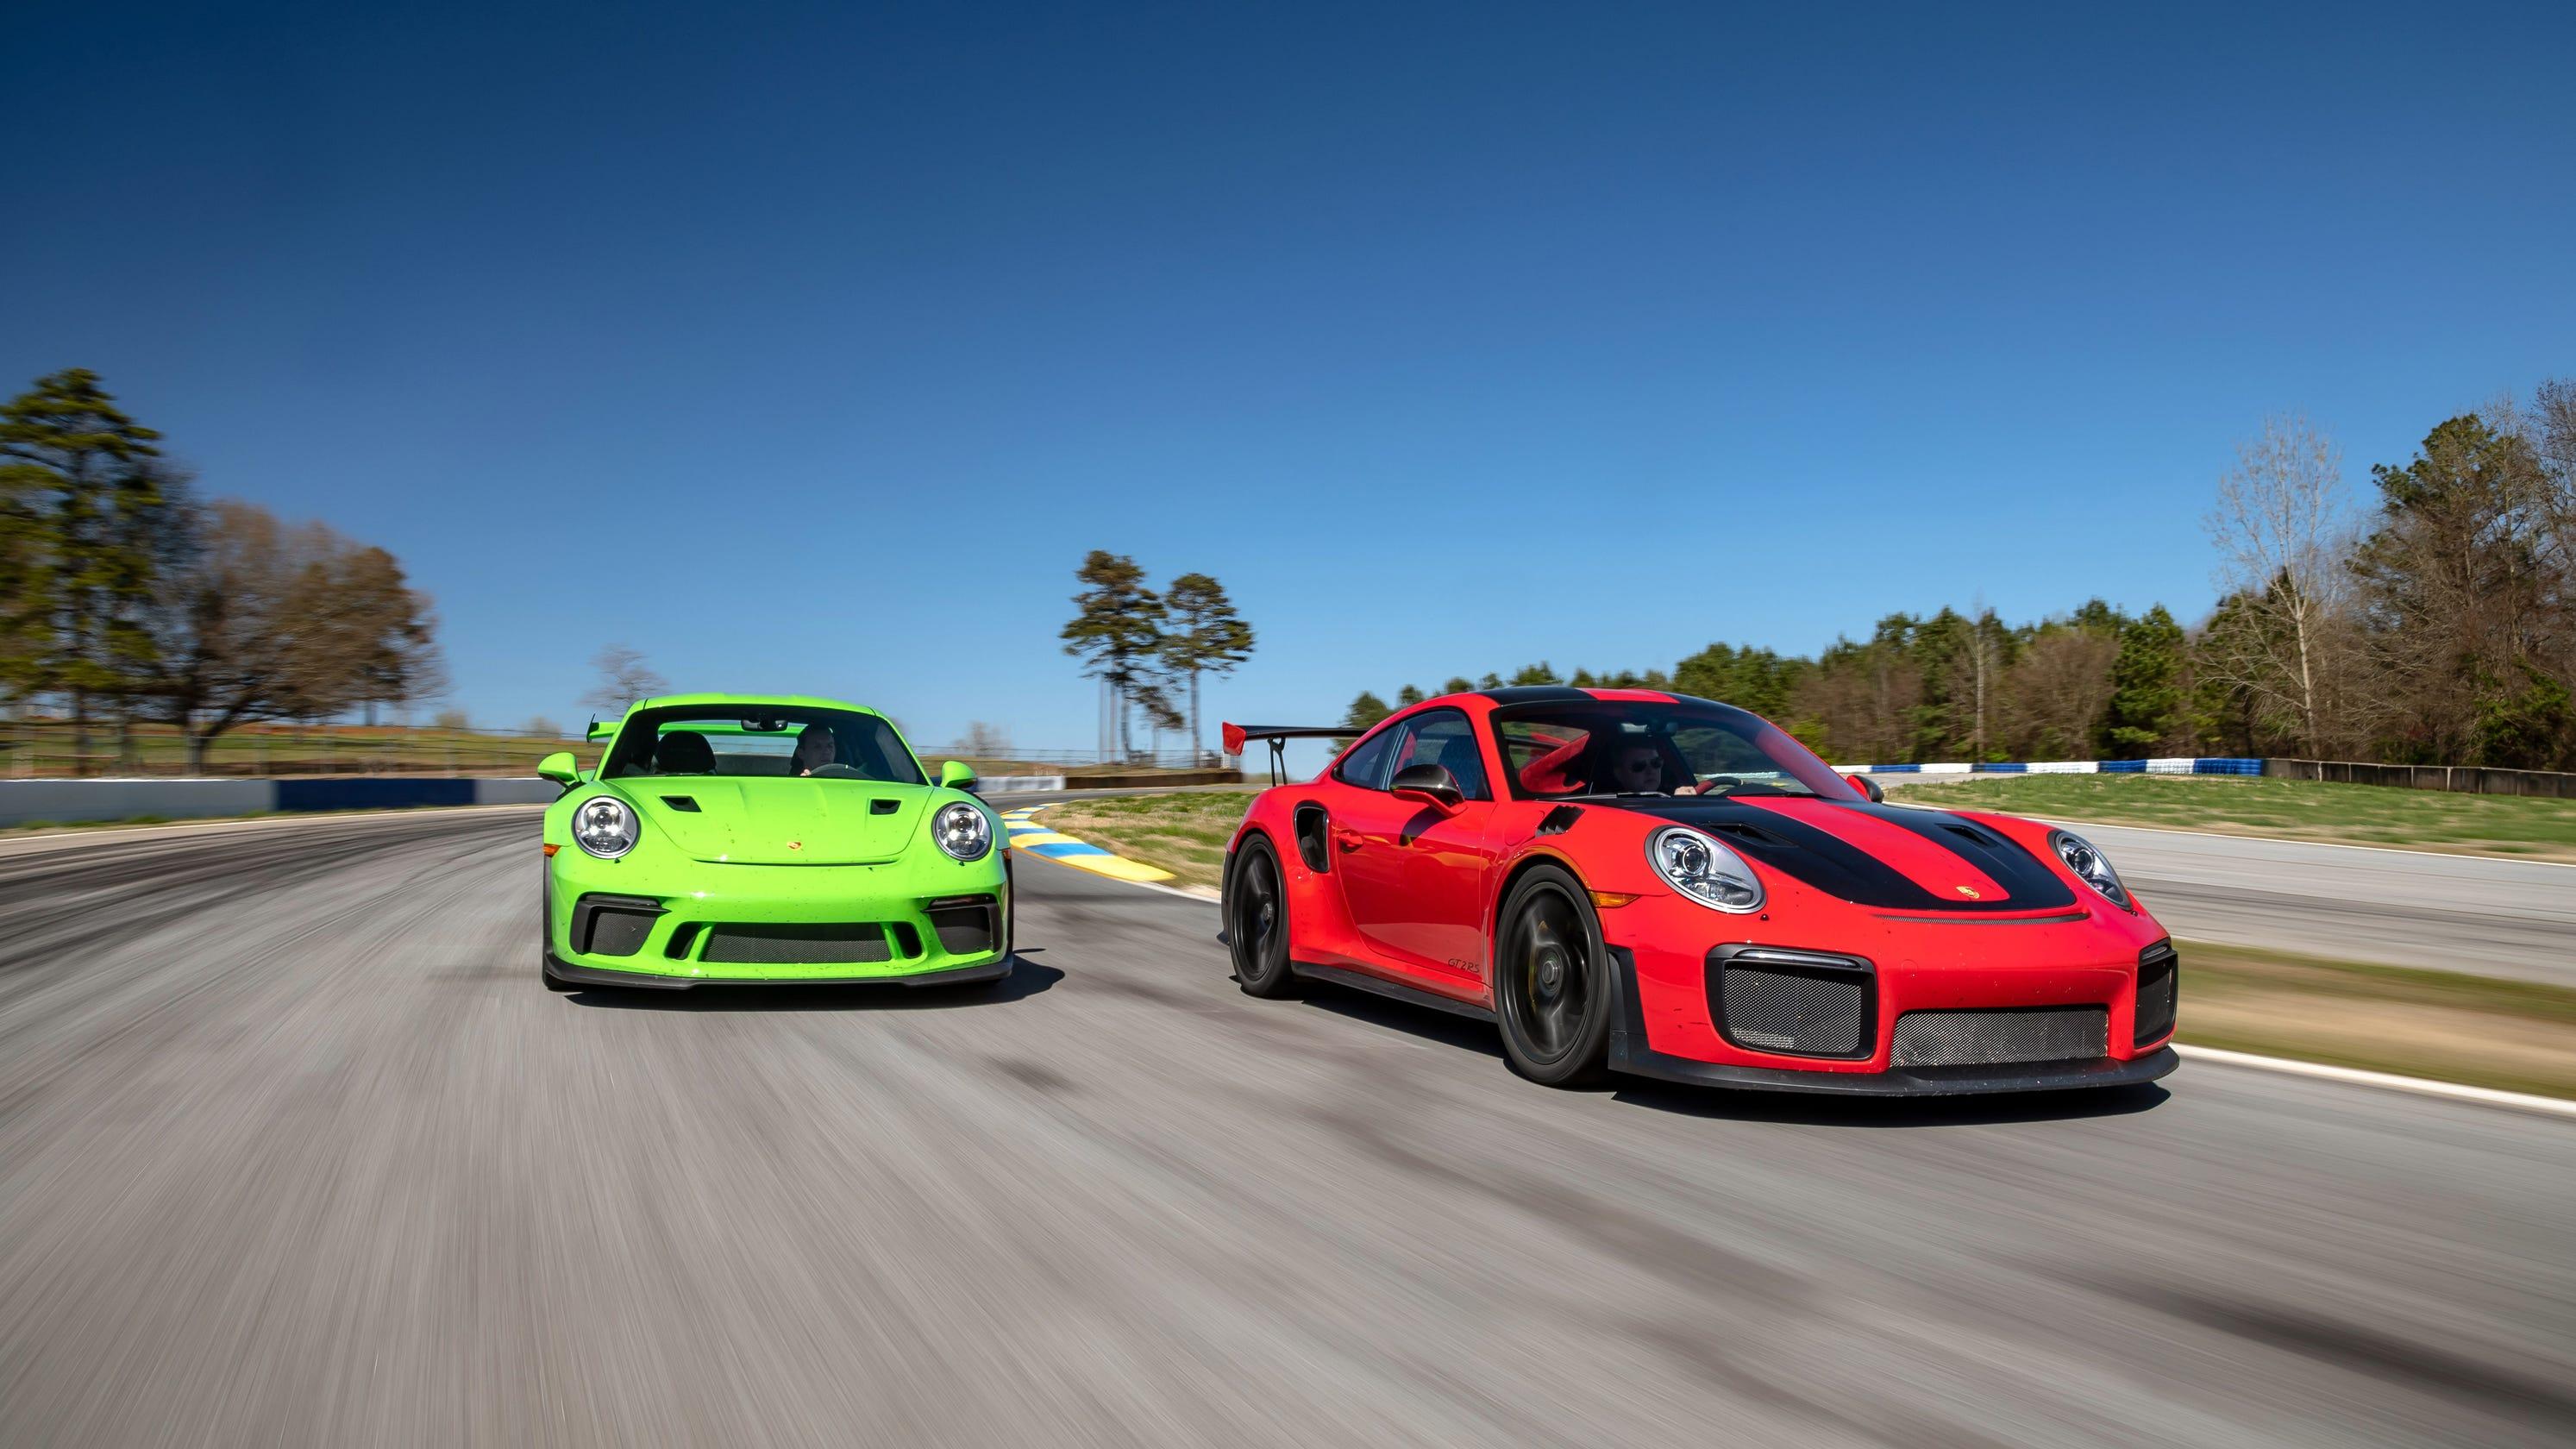 Porsche 911 Gt2 Sets Pace In Muscle Car Wars